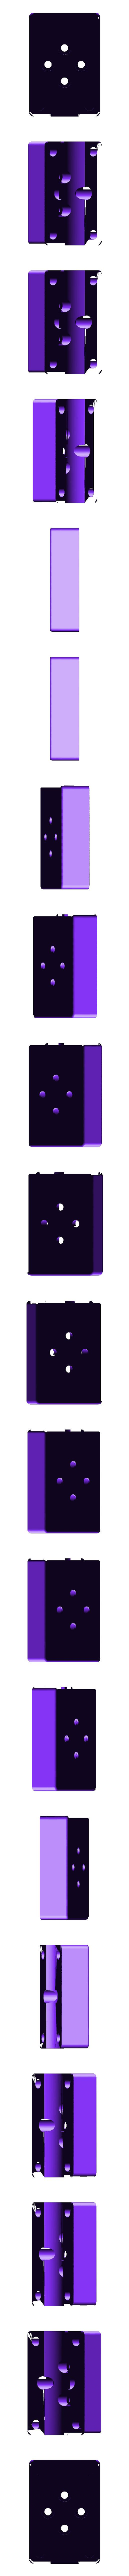 clamp-mount.stl Download free STL file Heat Set Insert Press • 3D printer object, Adafruit